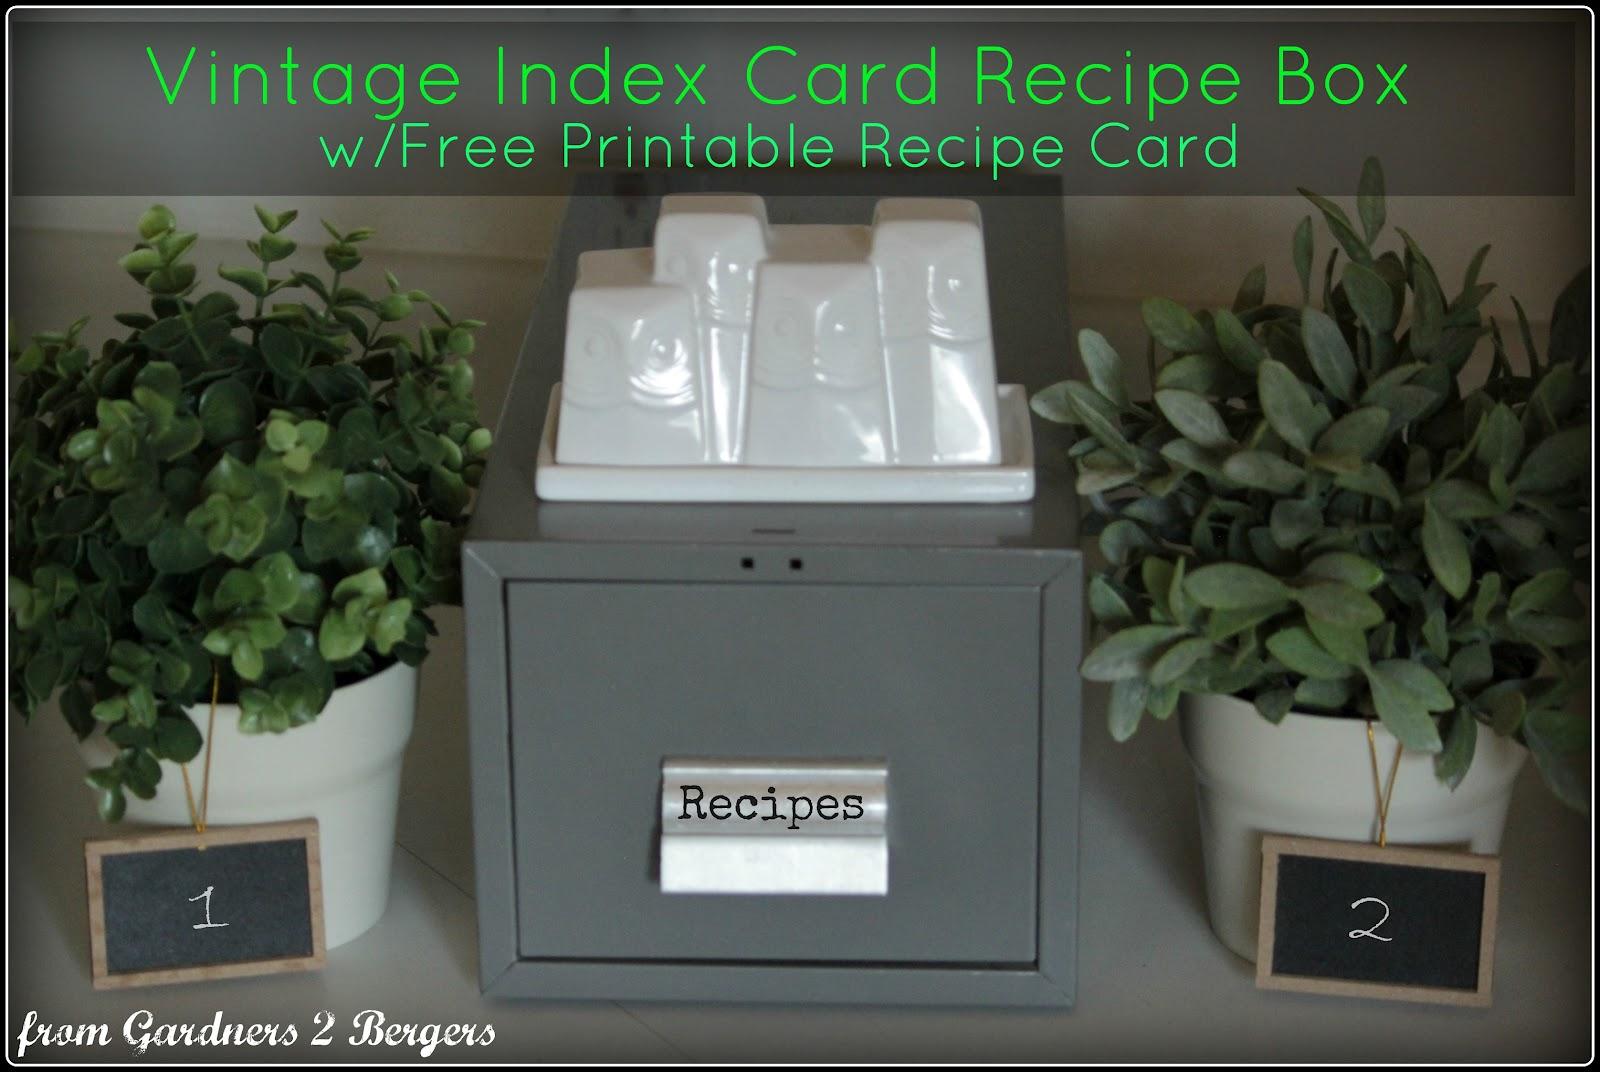 Vintage-Index-Card-Recipe-Box-Printable-Recipe-Cards